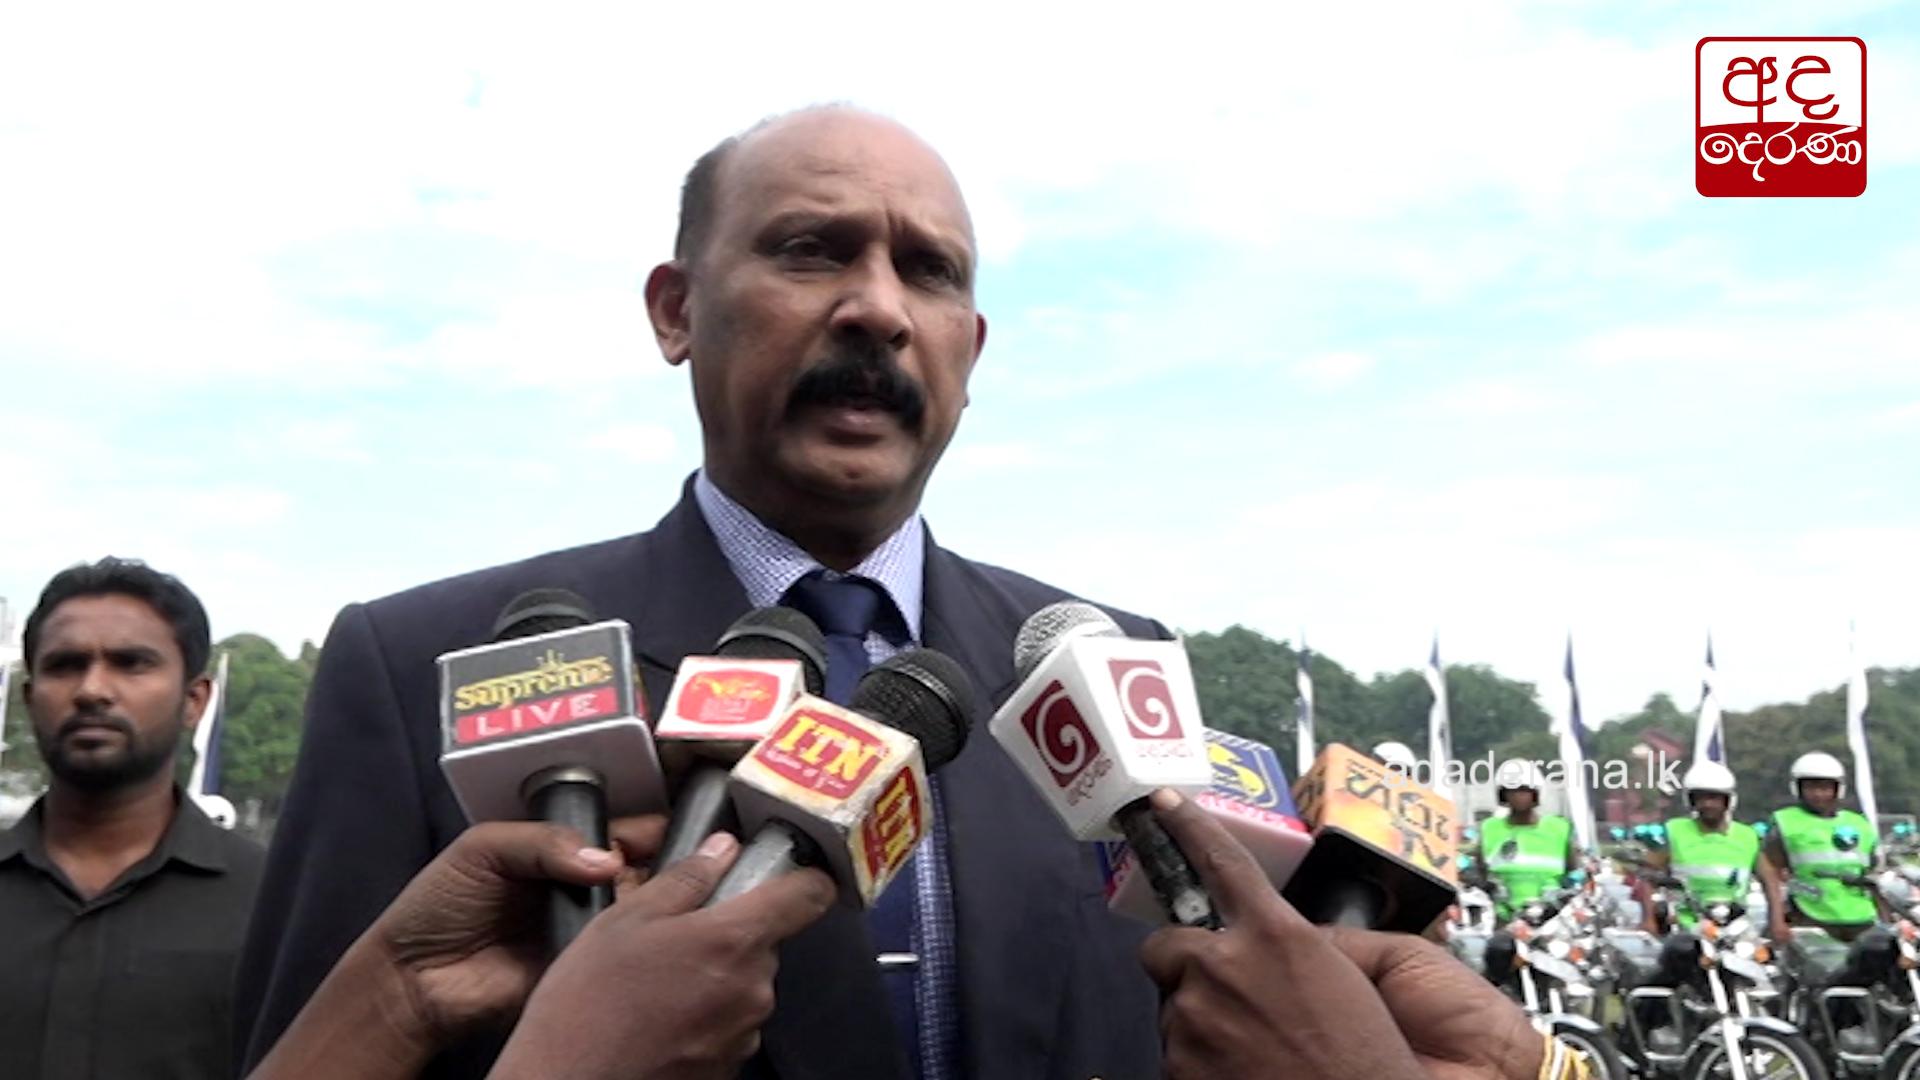 Security ensured for festive season - Defence Secretary